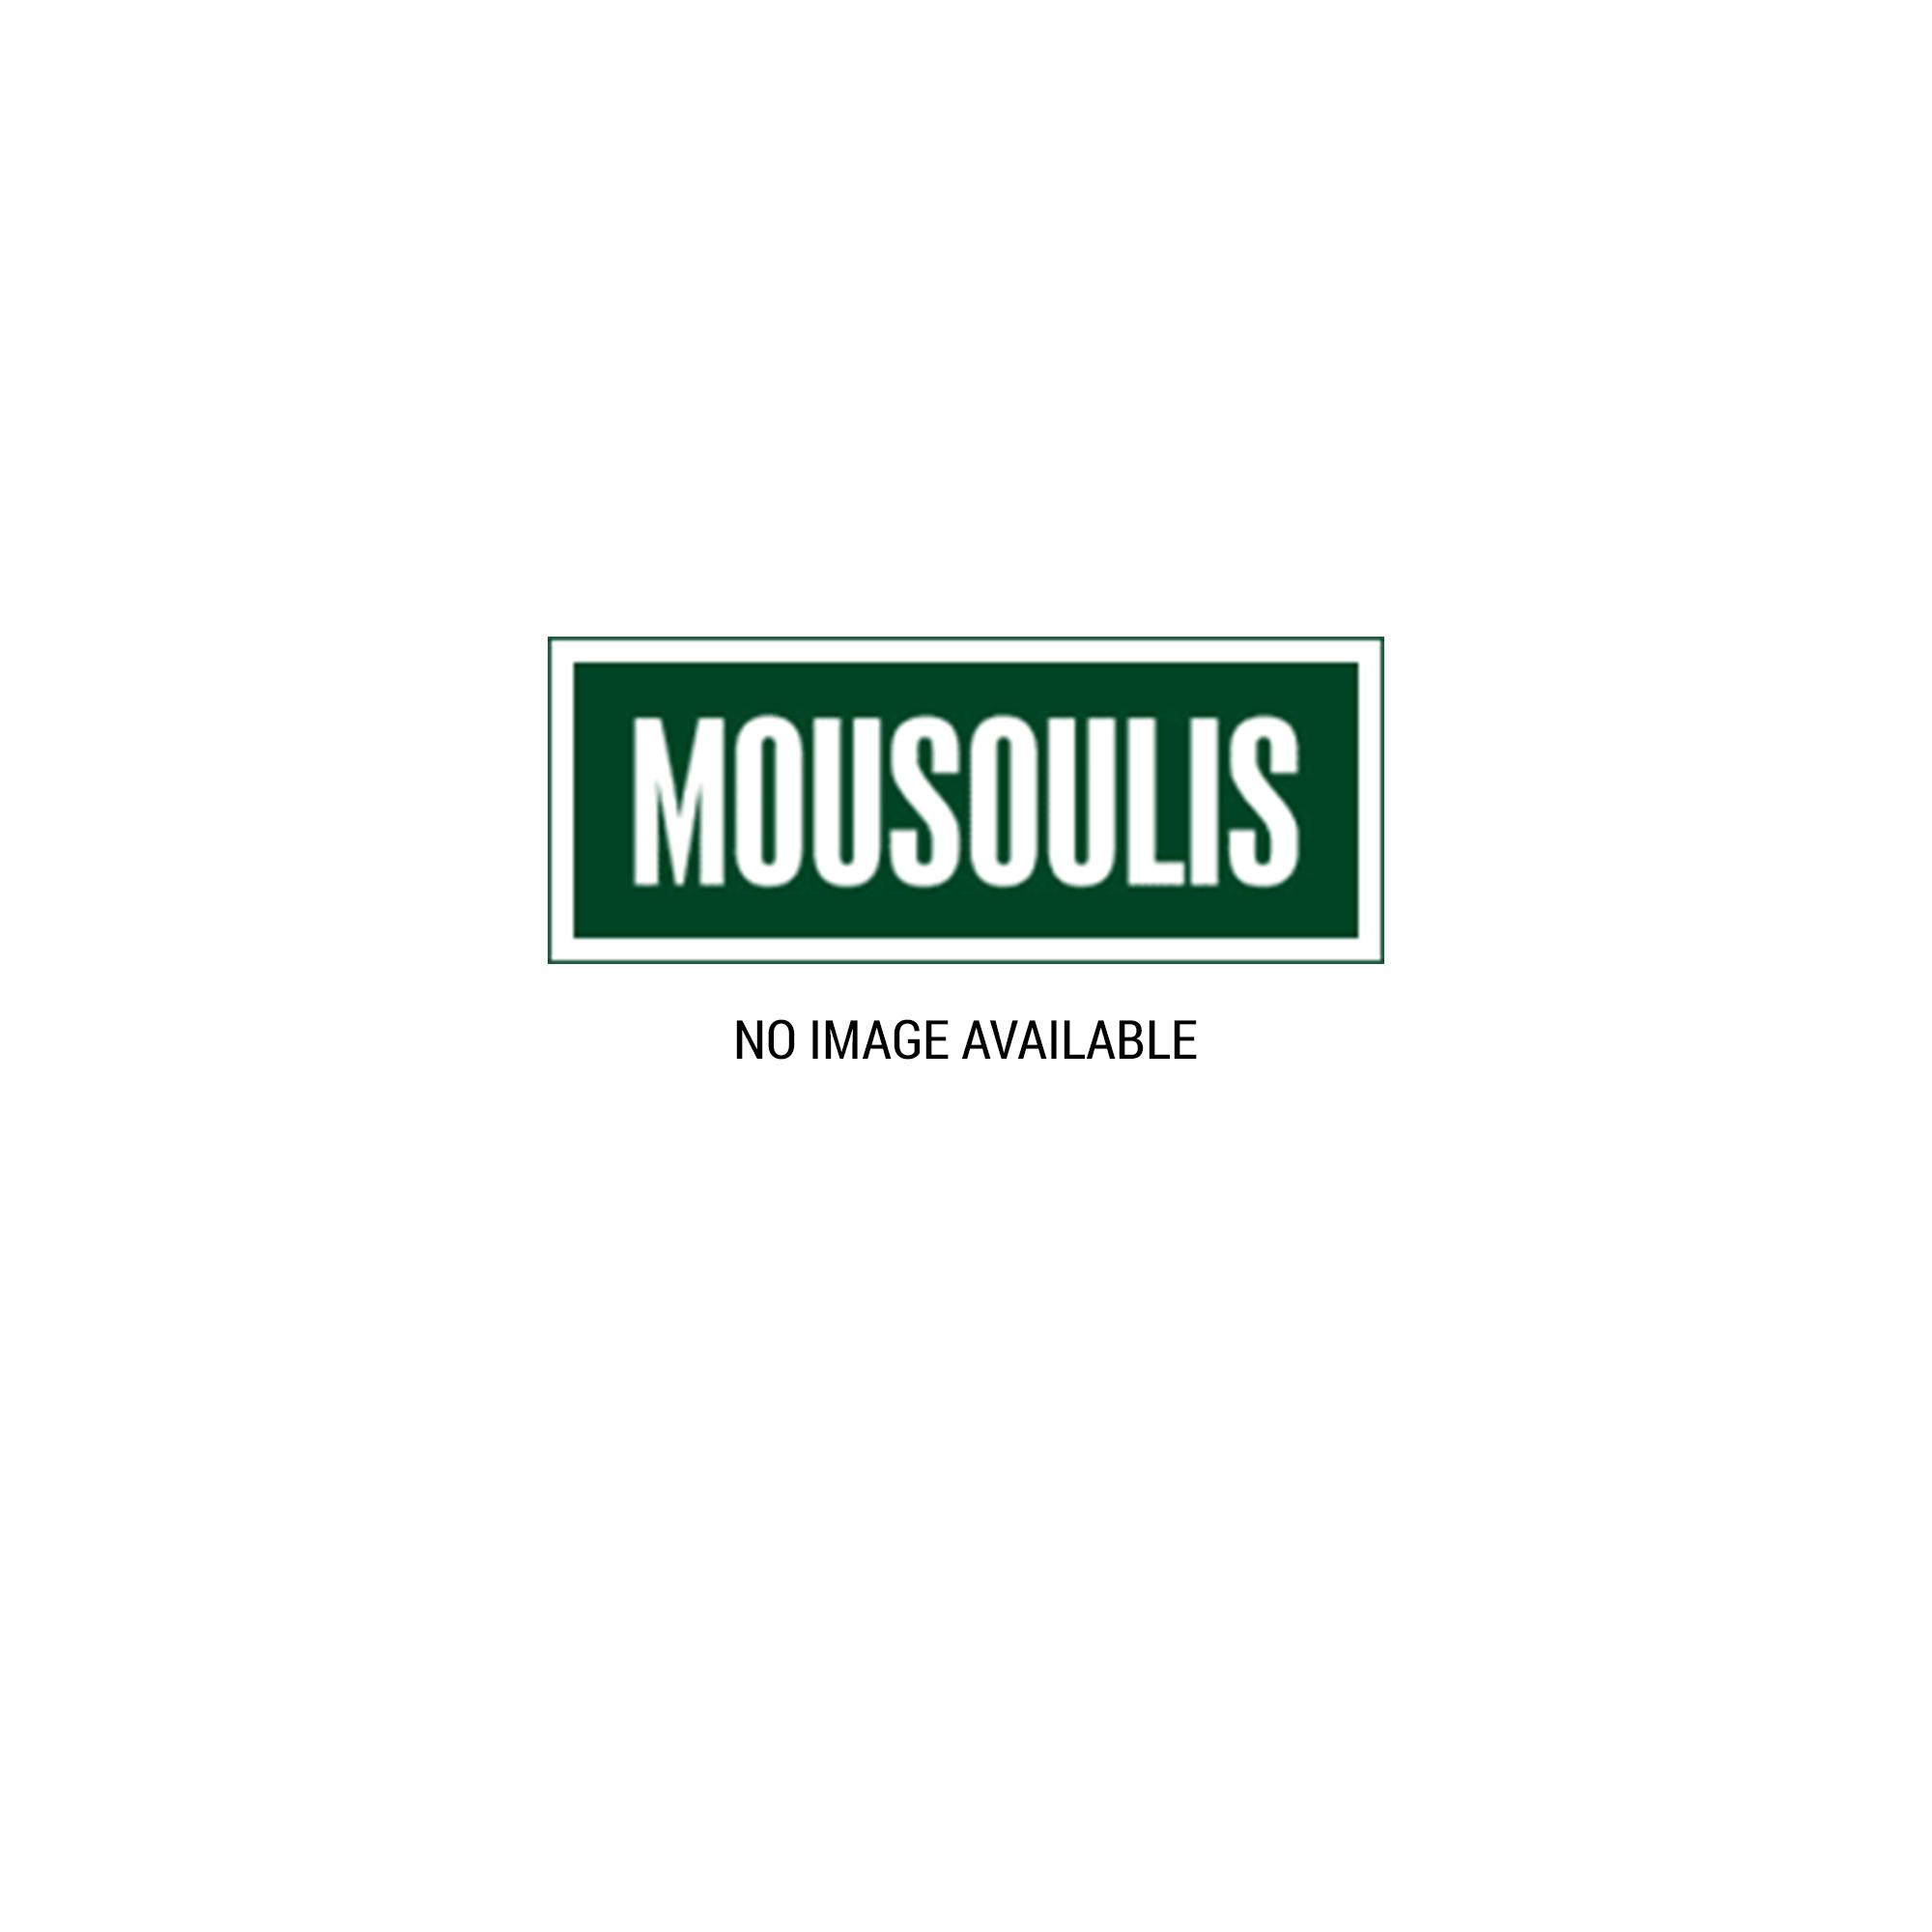 c595a59769c Ανδρικά Επώνυμα Μαγιό | Μαγιό από το MOUSOULIS